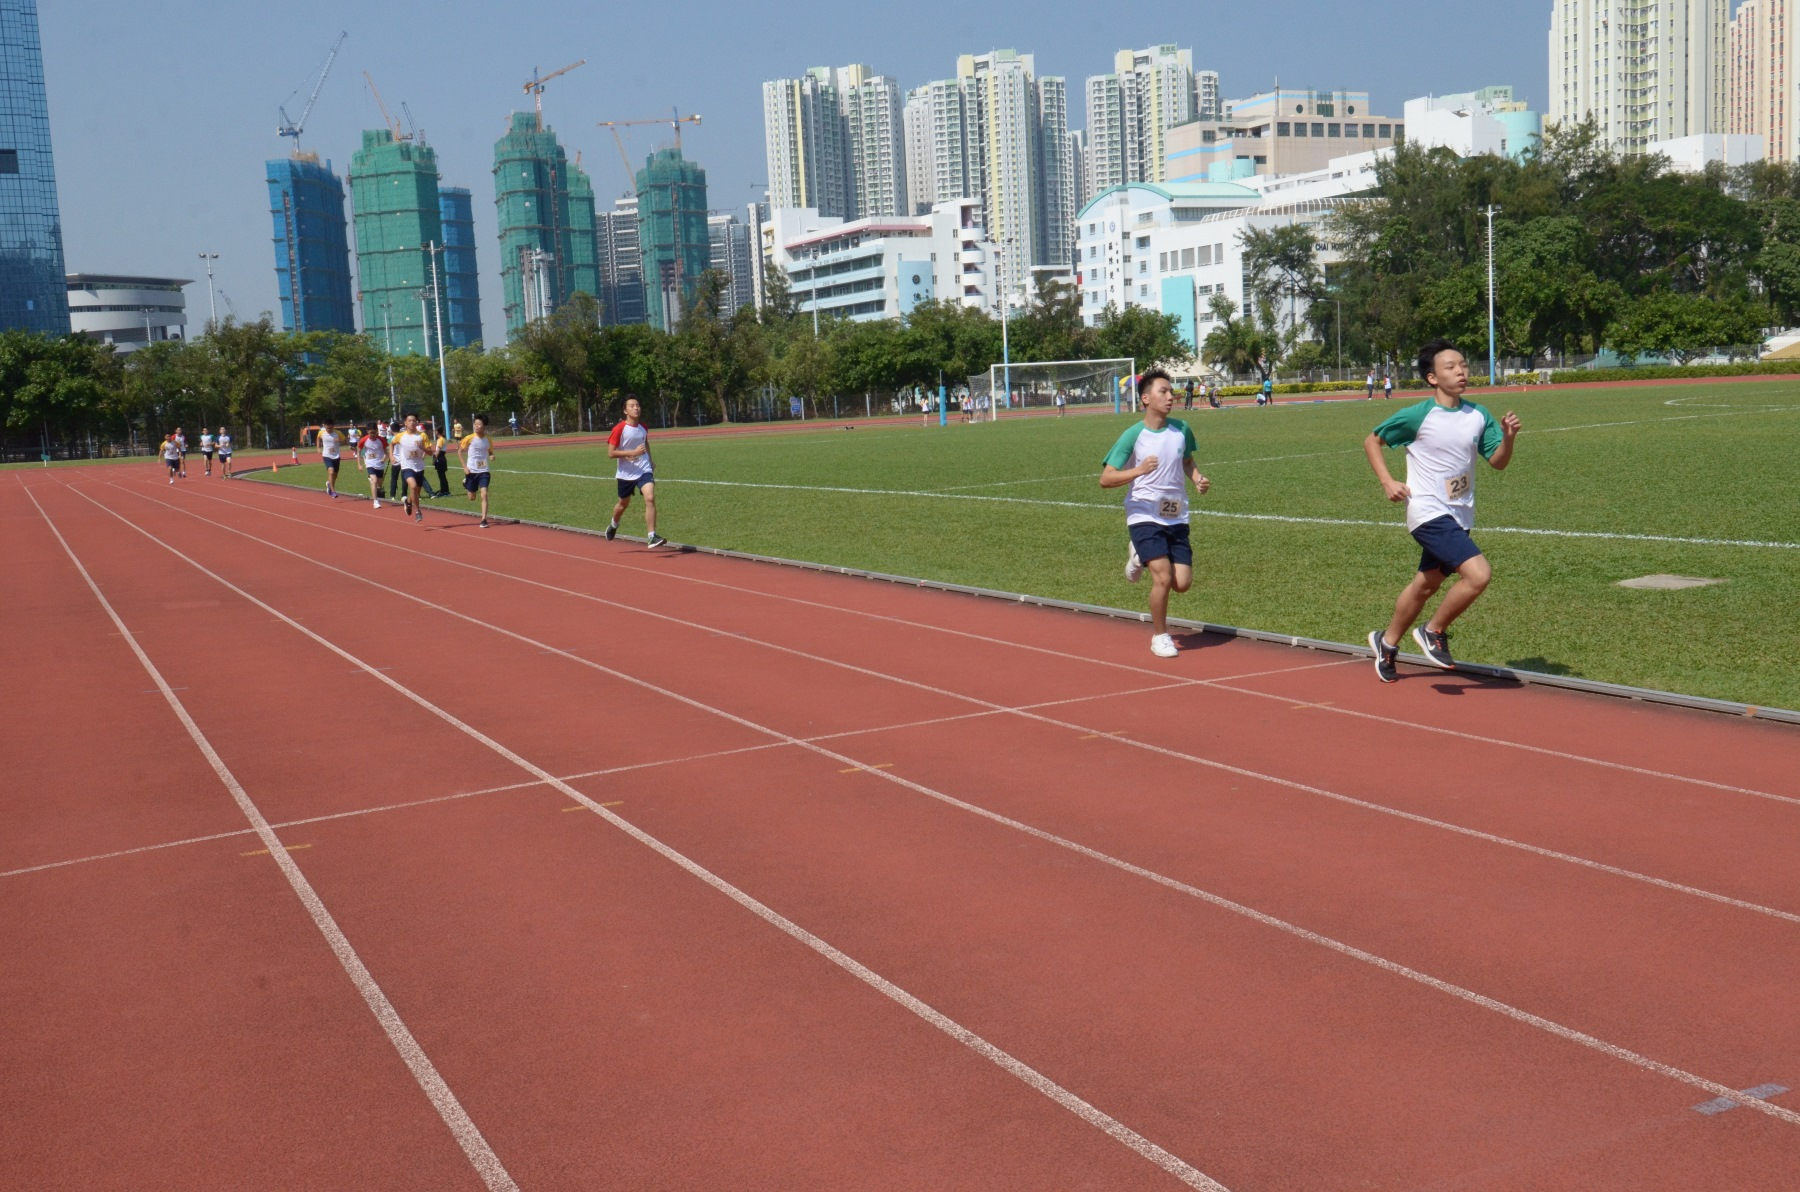 http://npc.edu.hk/sites/default/files/dsc_8773.jpg